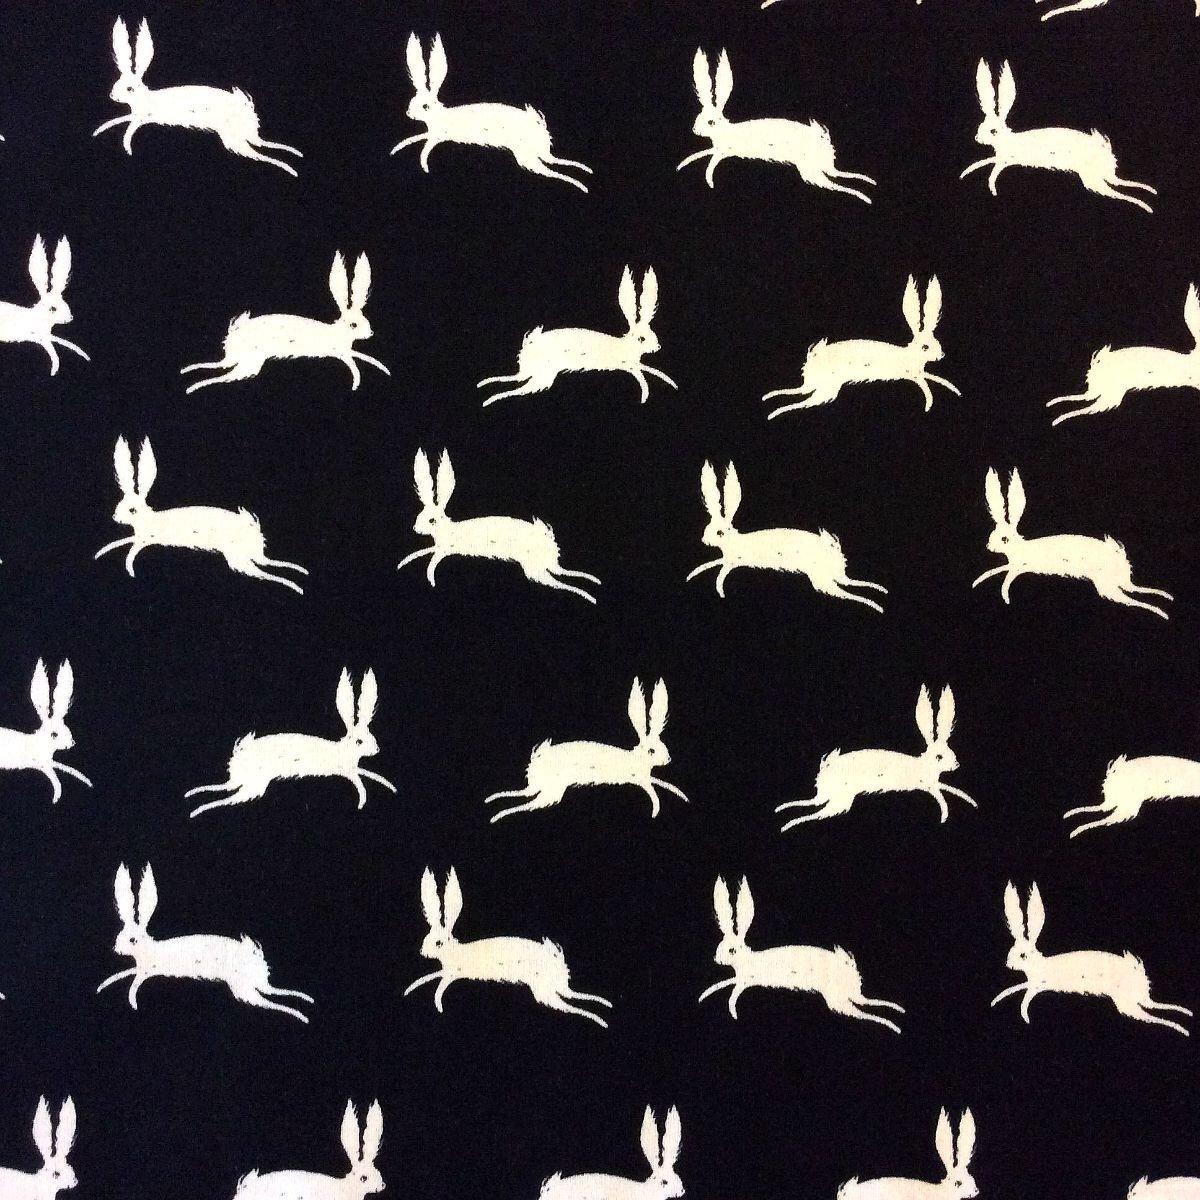 Last Piece! 13 x 44 Sarah Watts Cotton + Steel Rabbits Jumping Bunny Cotton Quilt Fabric PCCTN33